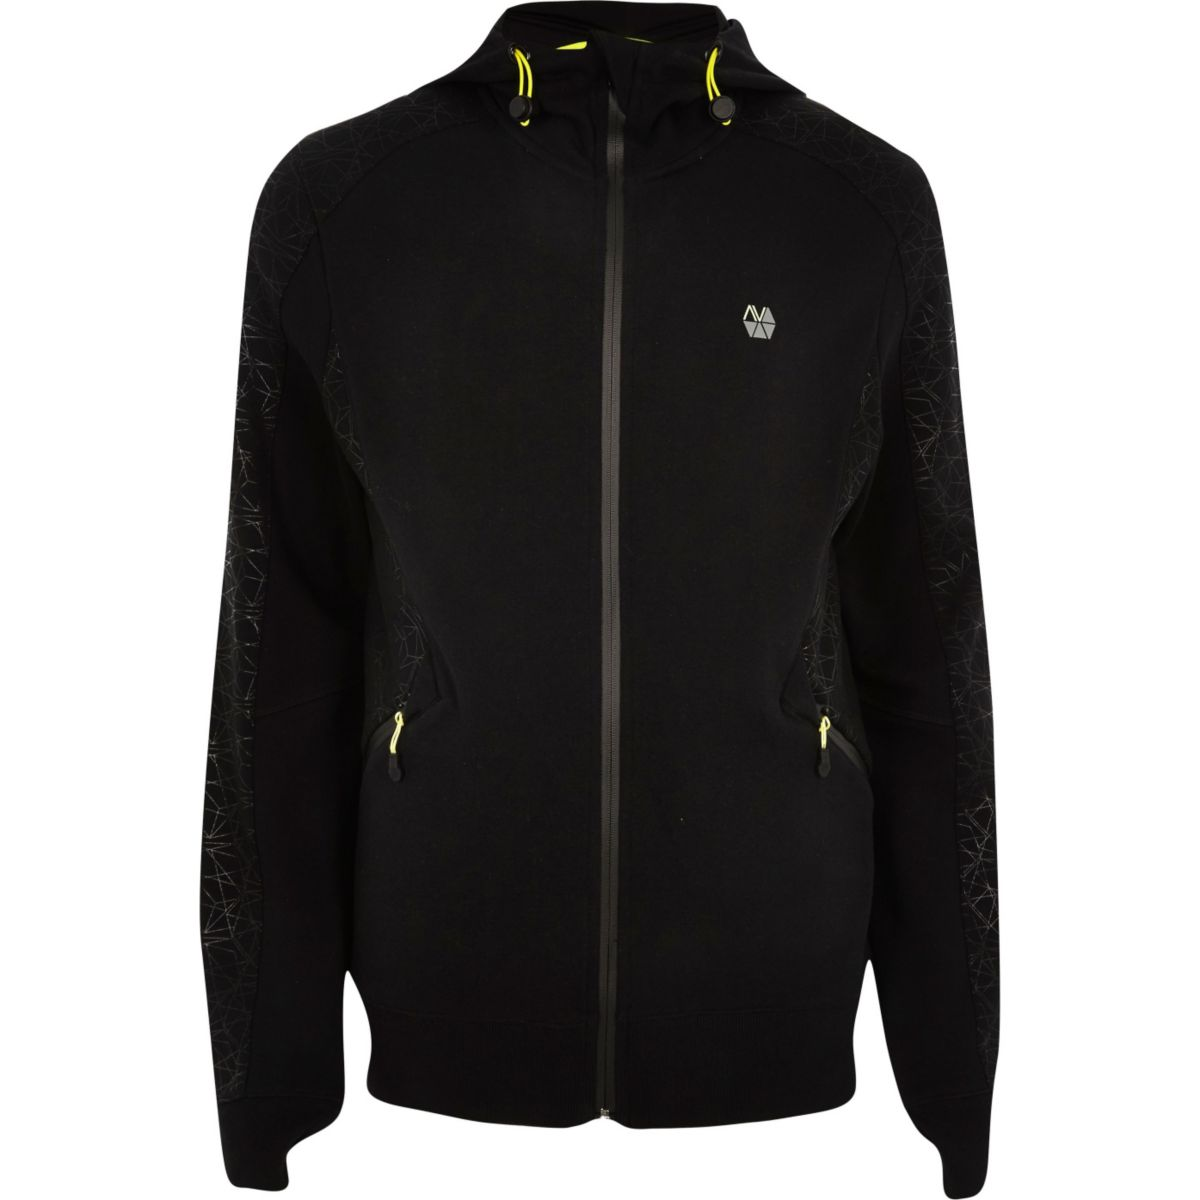 RI Active black fluro zip sports hoodie